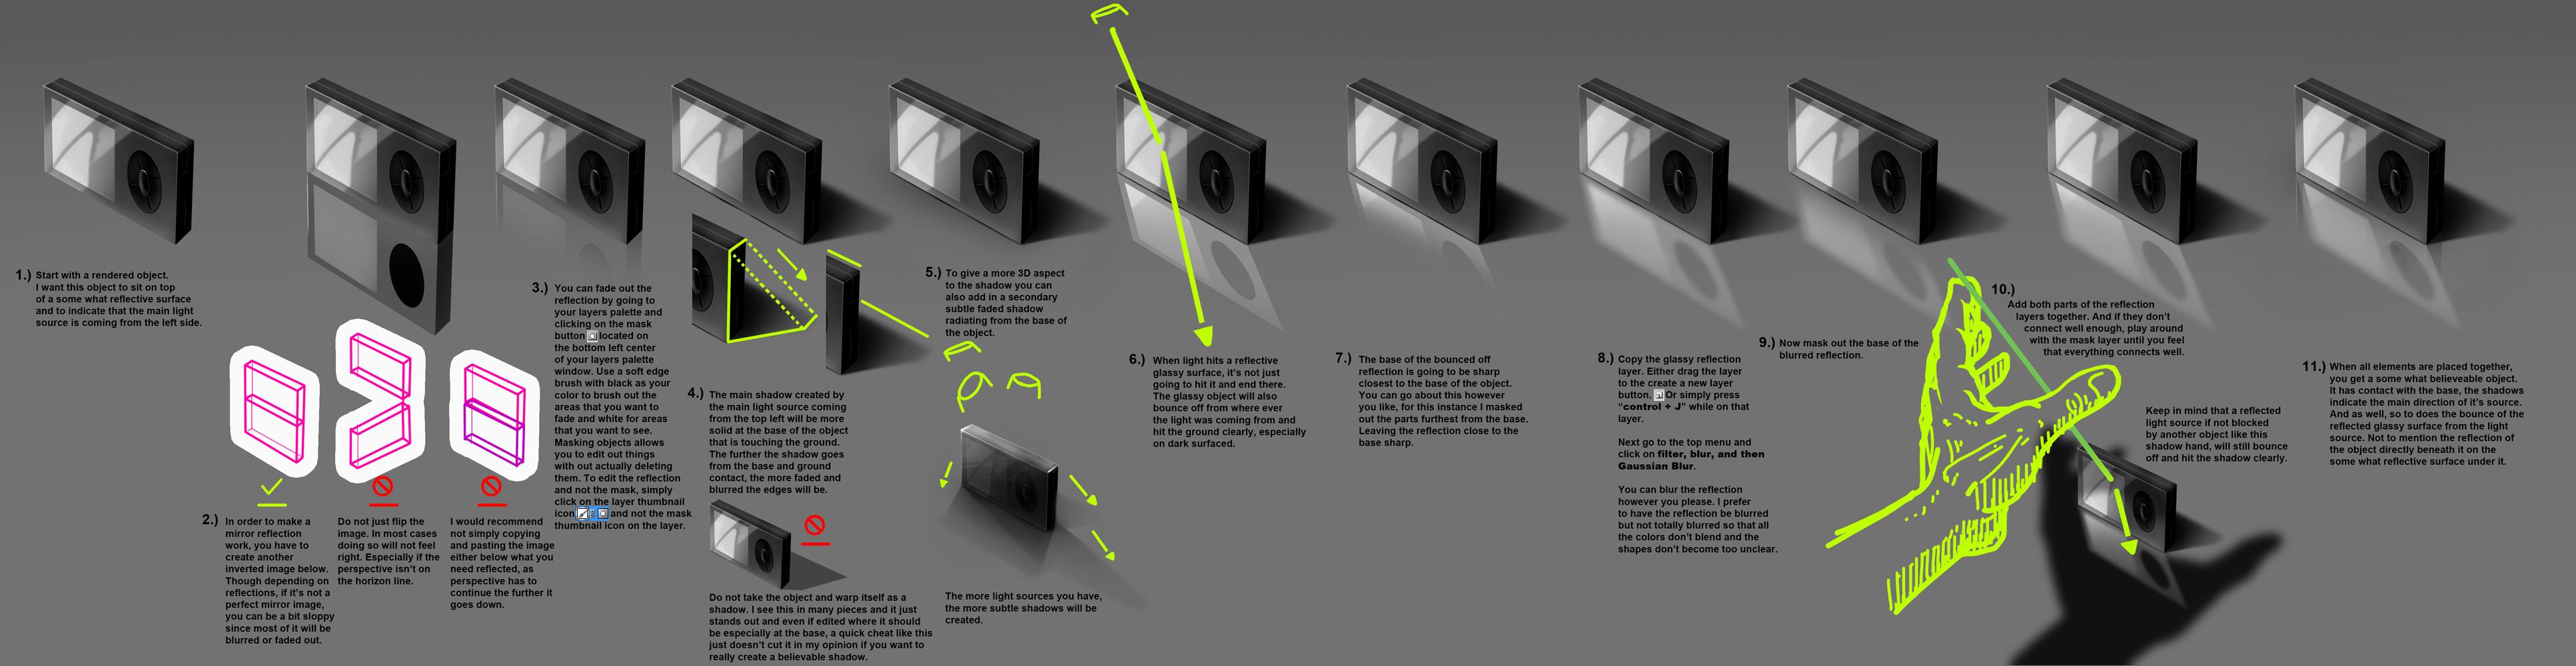 shadow reflection tutorial #0001 Learnuary by danimation2001